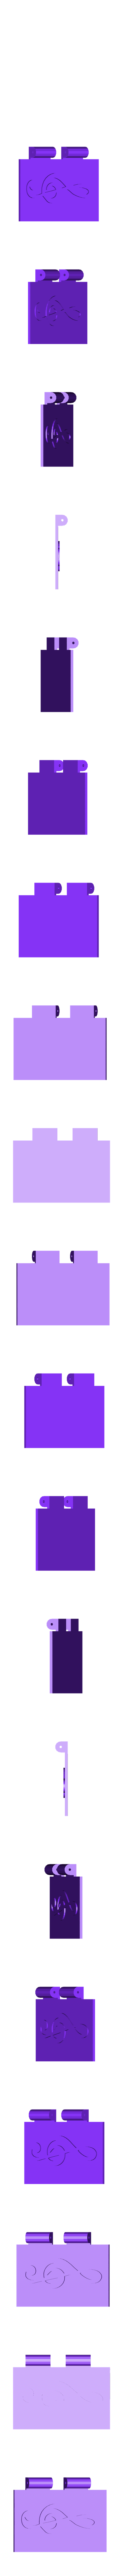 caja_tapa.stl Download STL file Piano Hole Punch Music Box • 3D printable model, drk0027